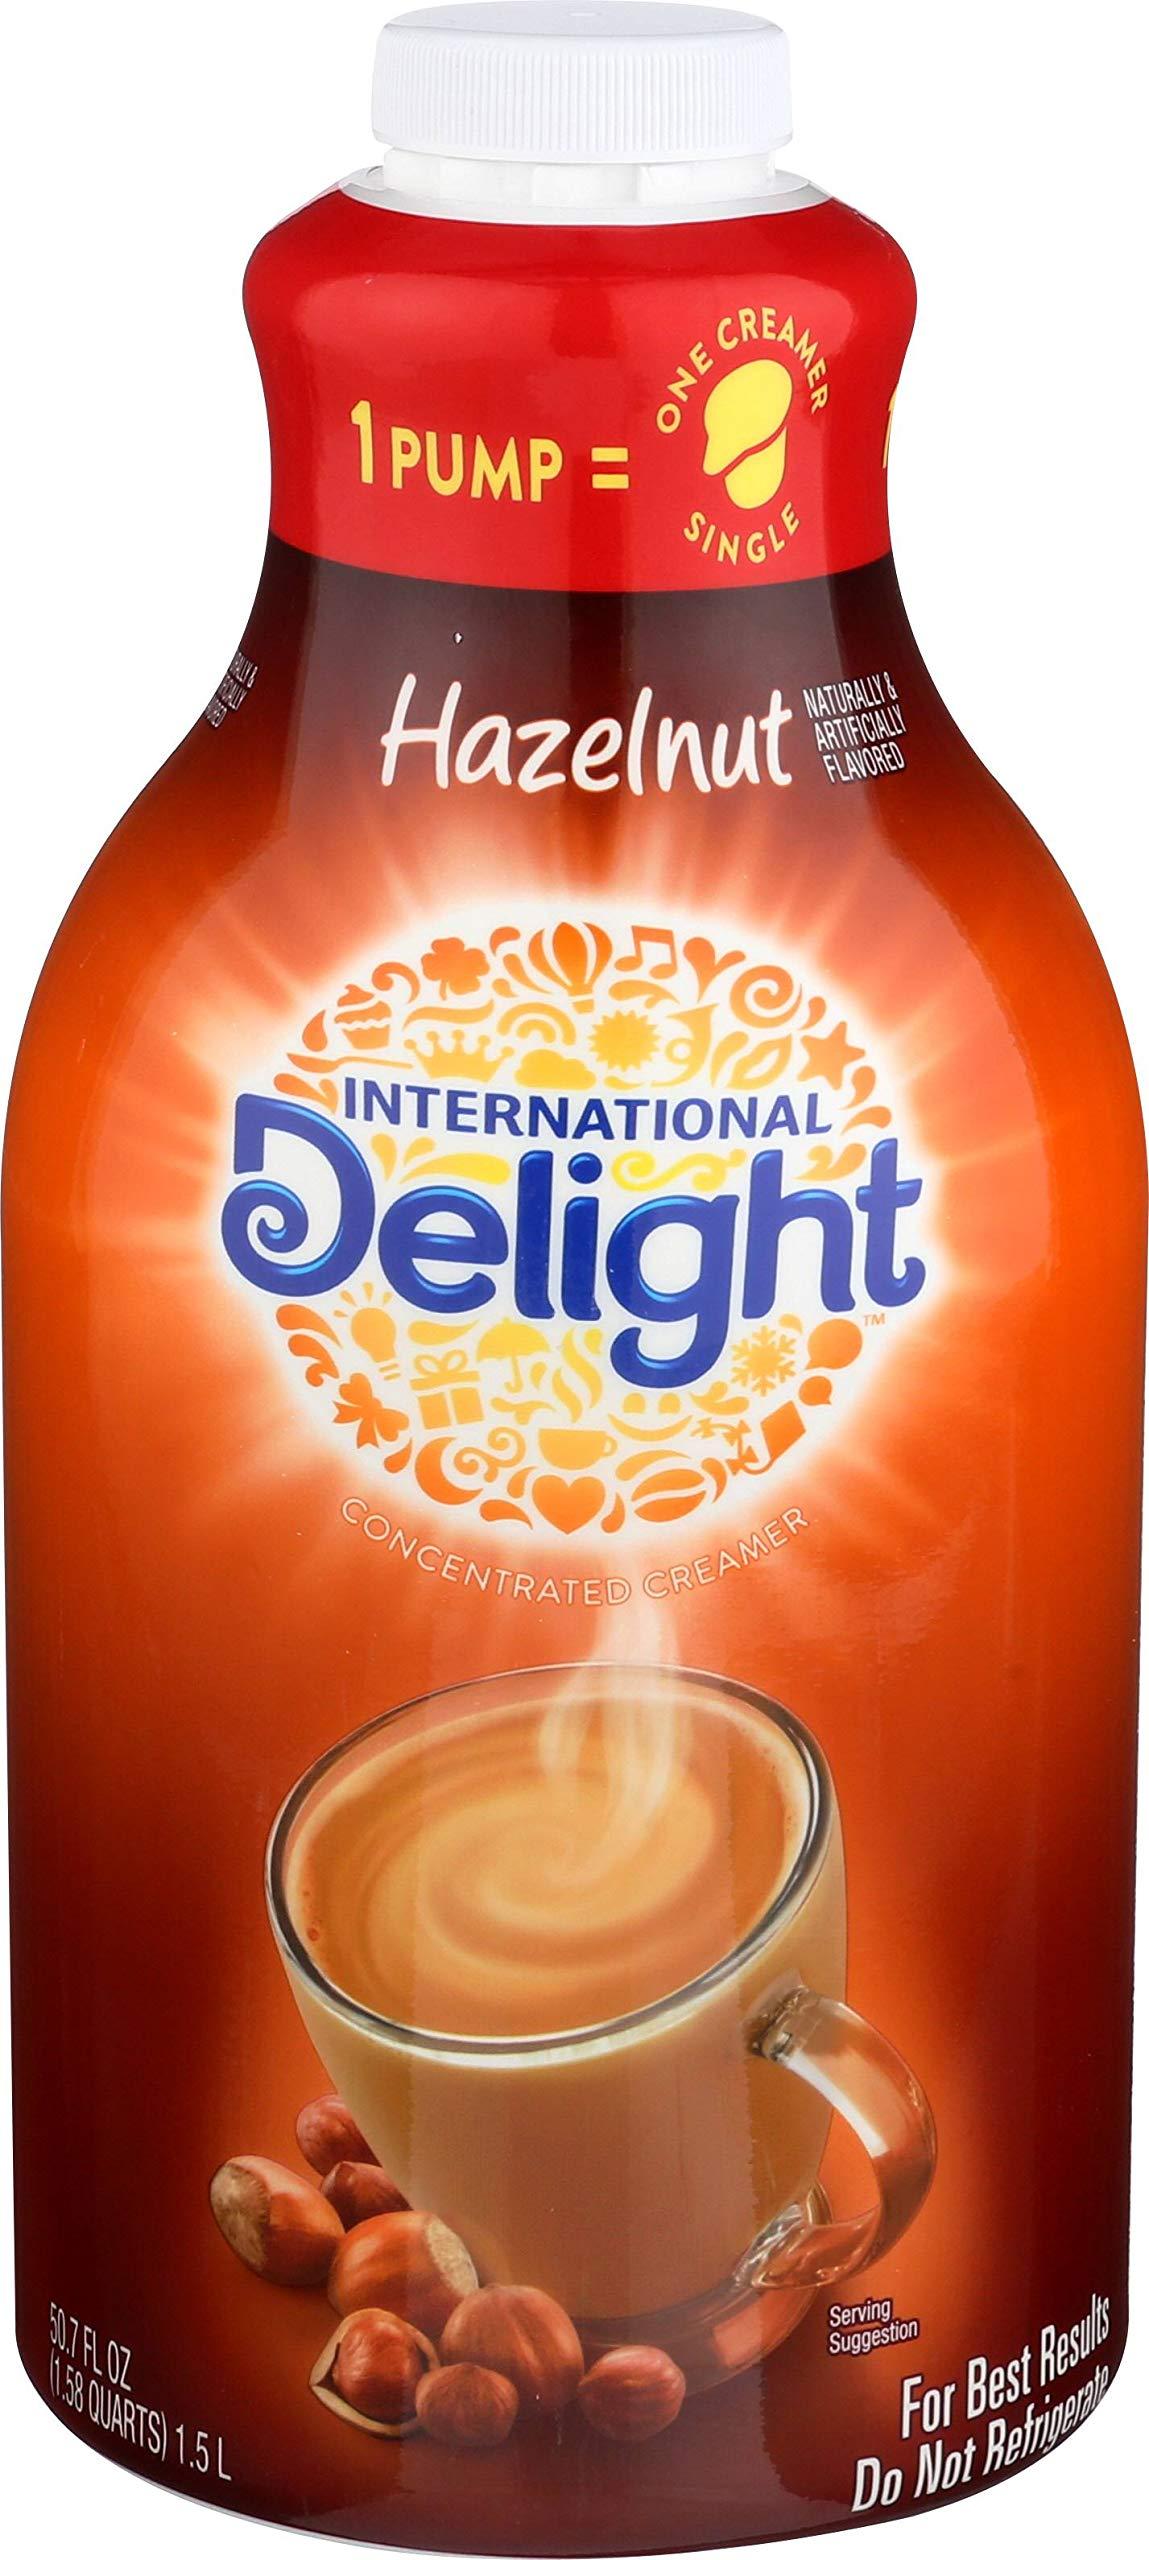 International Delight Hazelnut Coffee Creamer Pump, 50.7 oz by International Delight